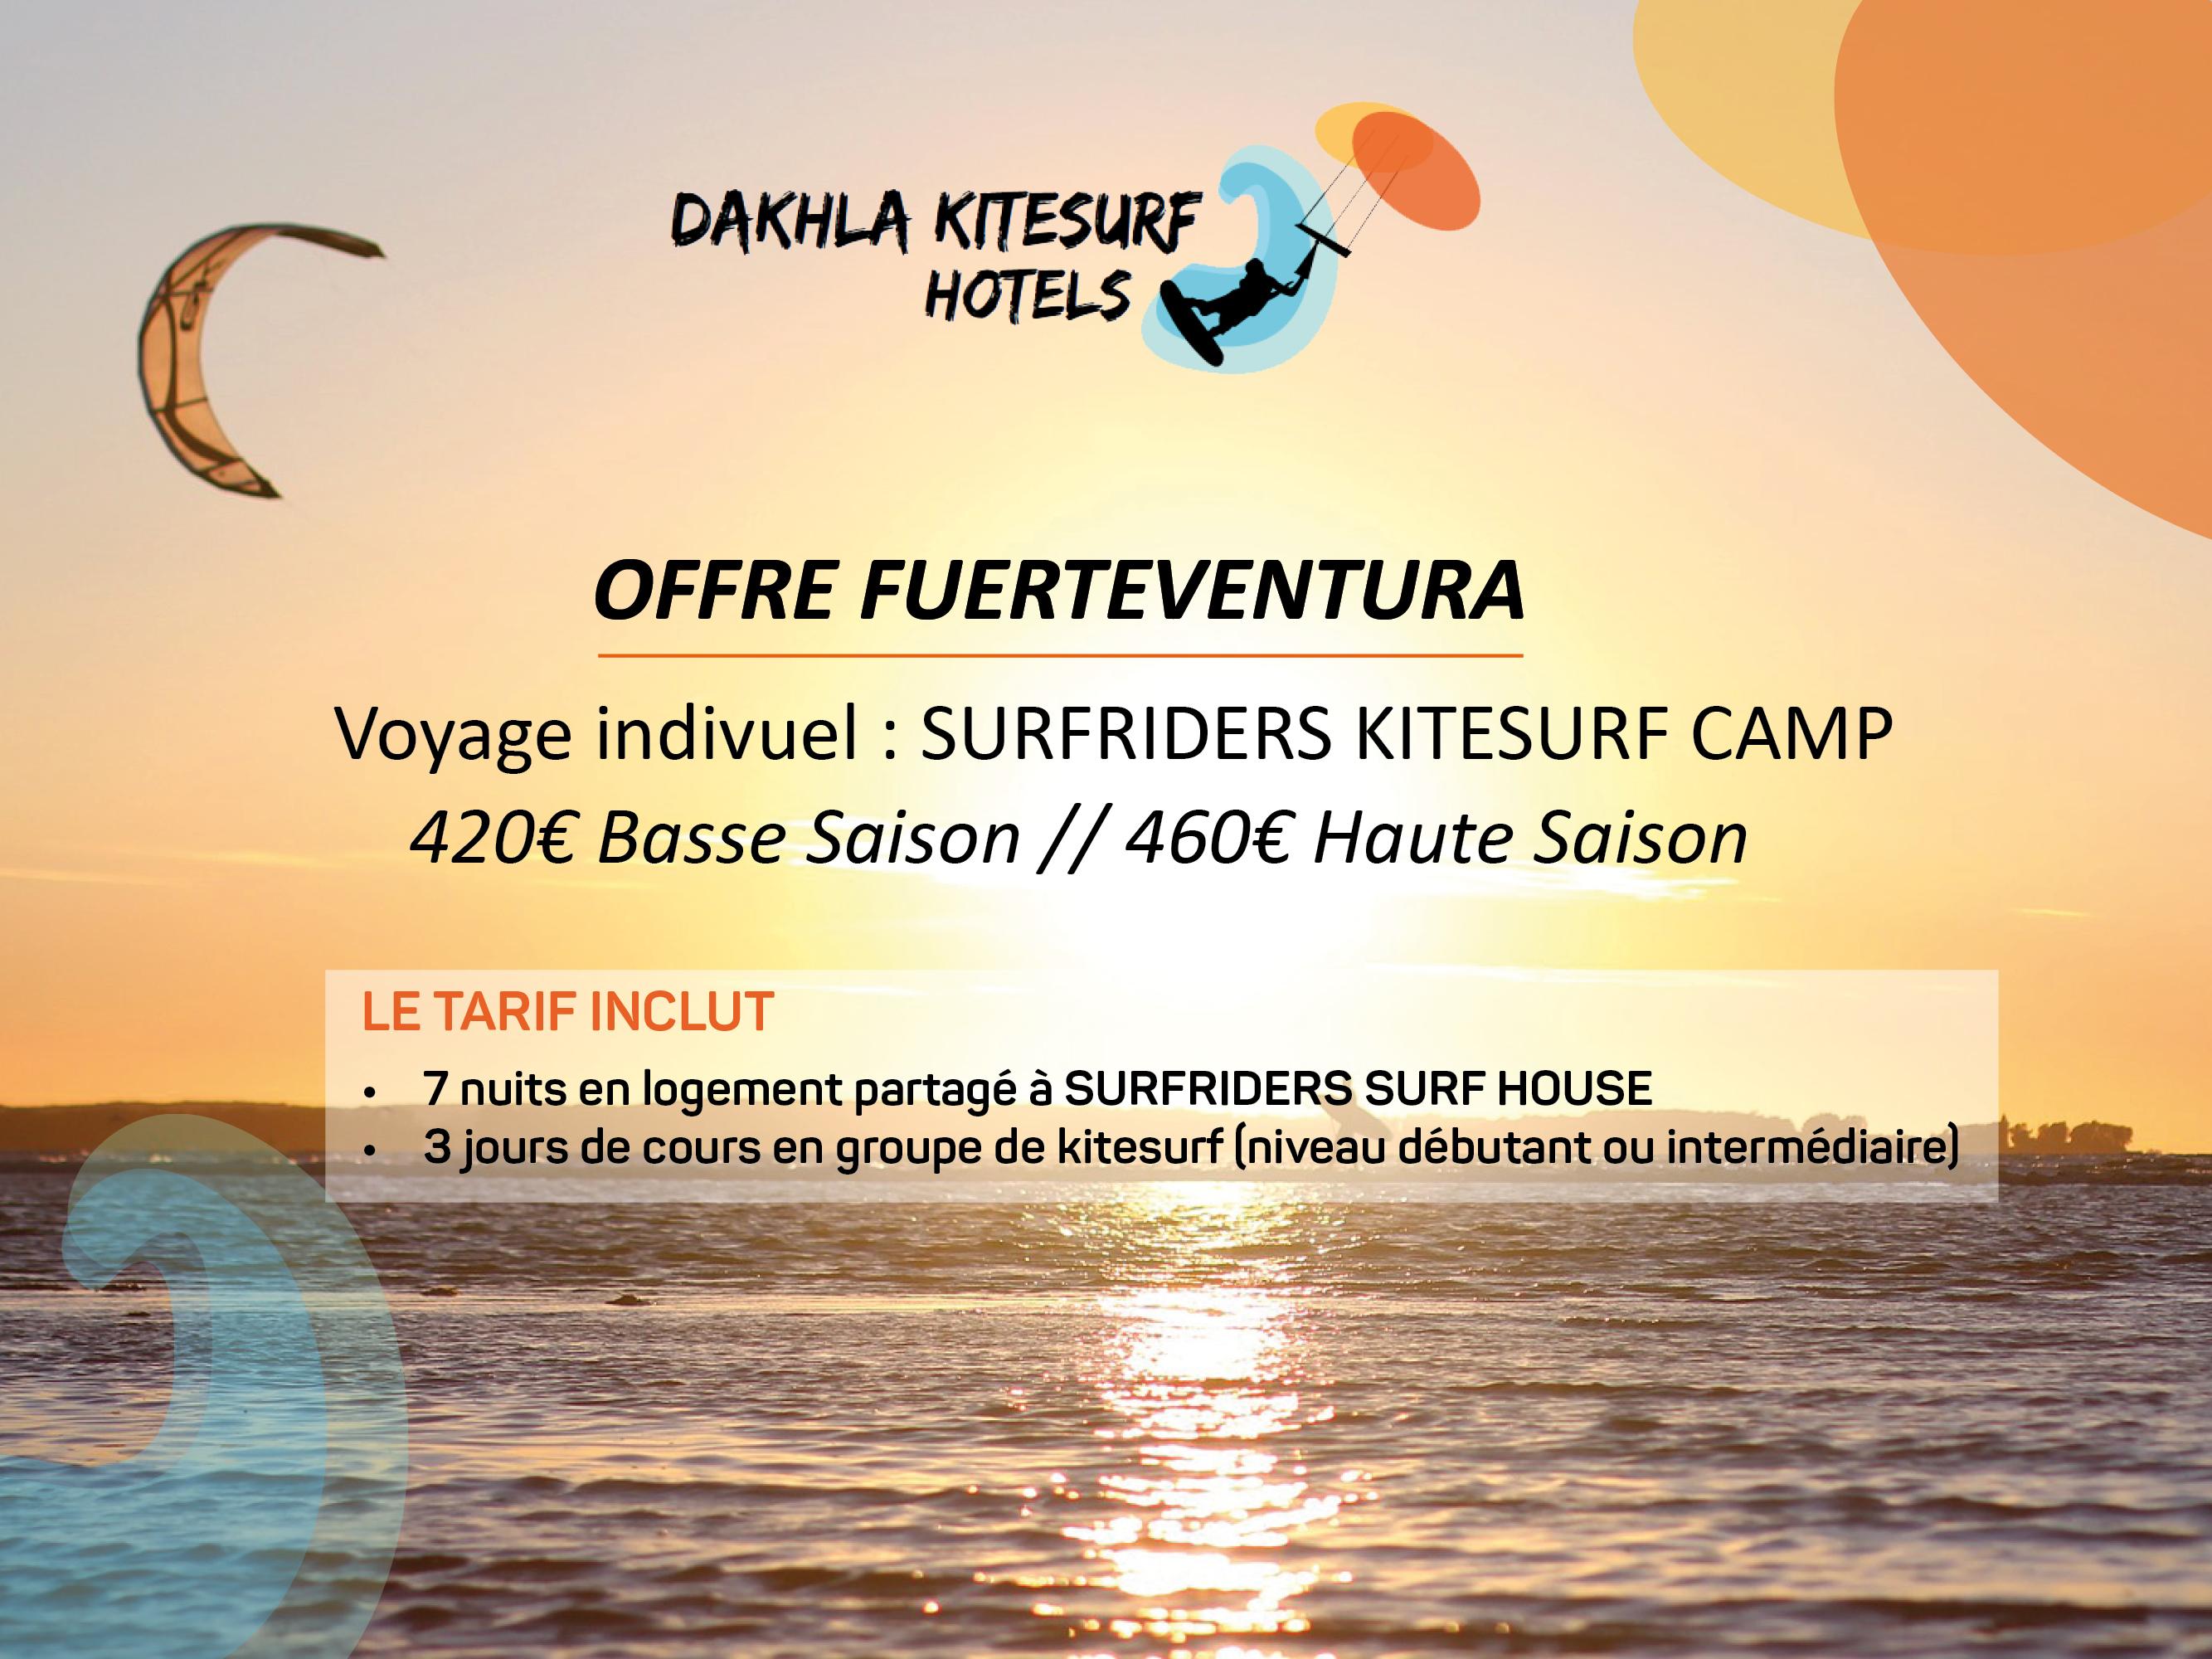 kitesurf fuerteventura dakhla kitesurf hotels